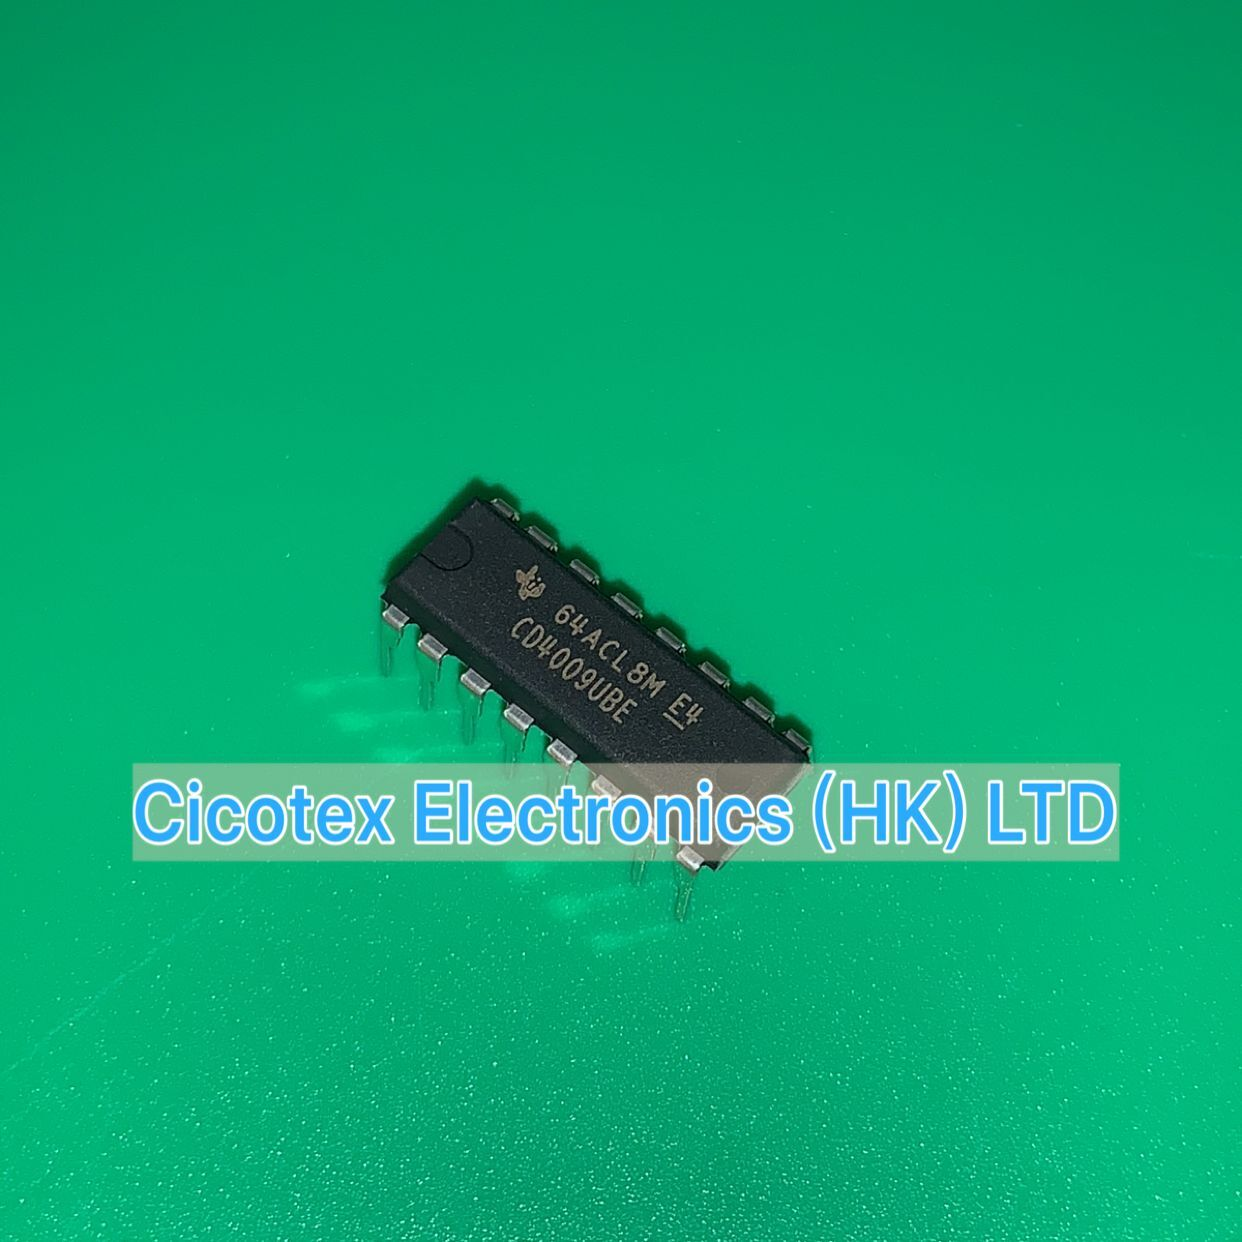 10 pcs/lot CD4009UBE DIP16 CD4009 UBE IC HEXAGONALE INVERTI BUFF-CONV 16-DIP CD 4009UBE CD4009BE